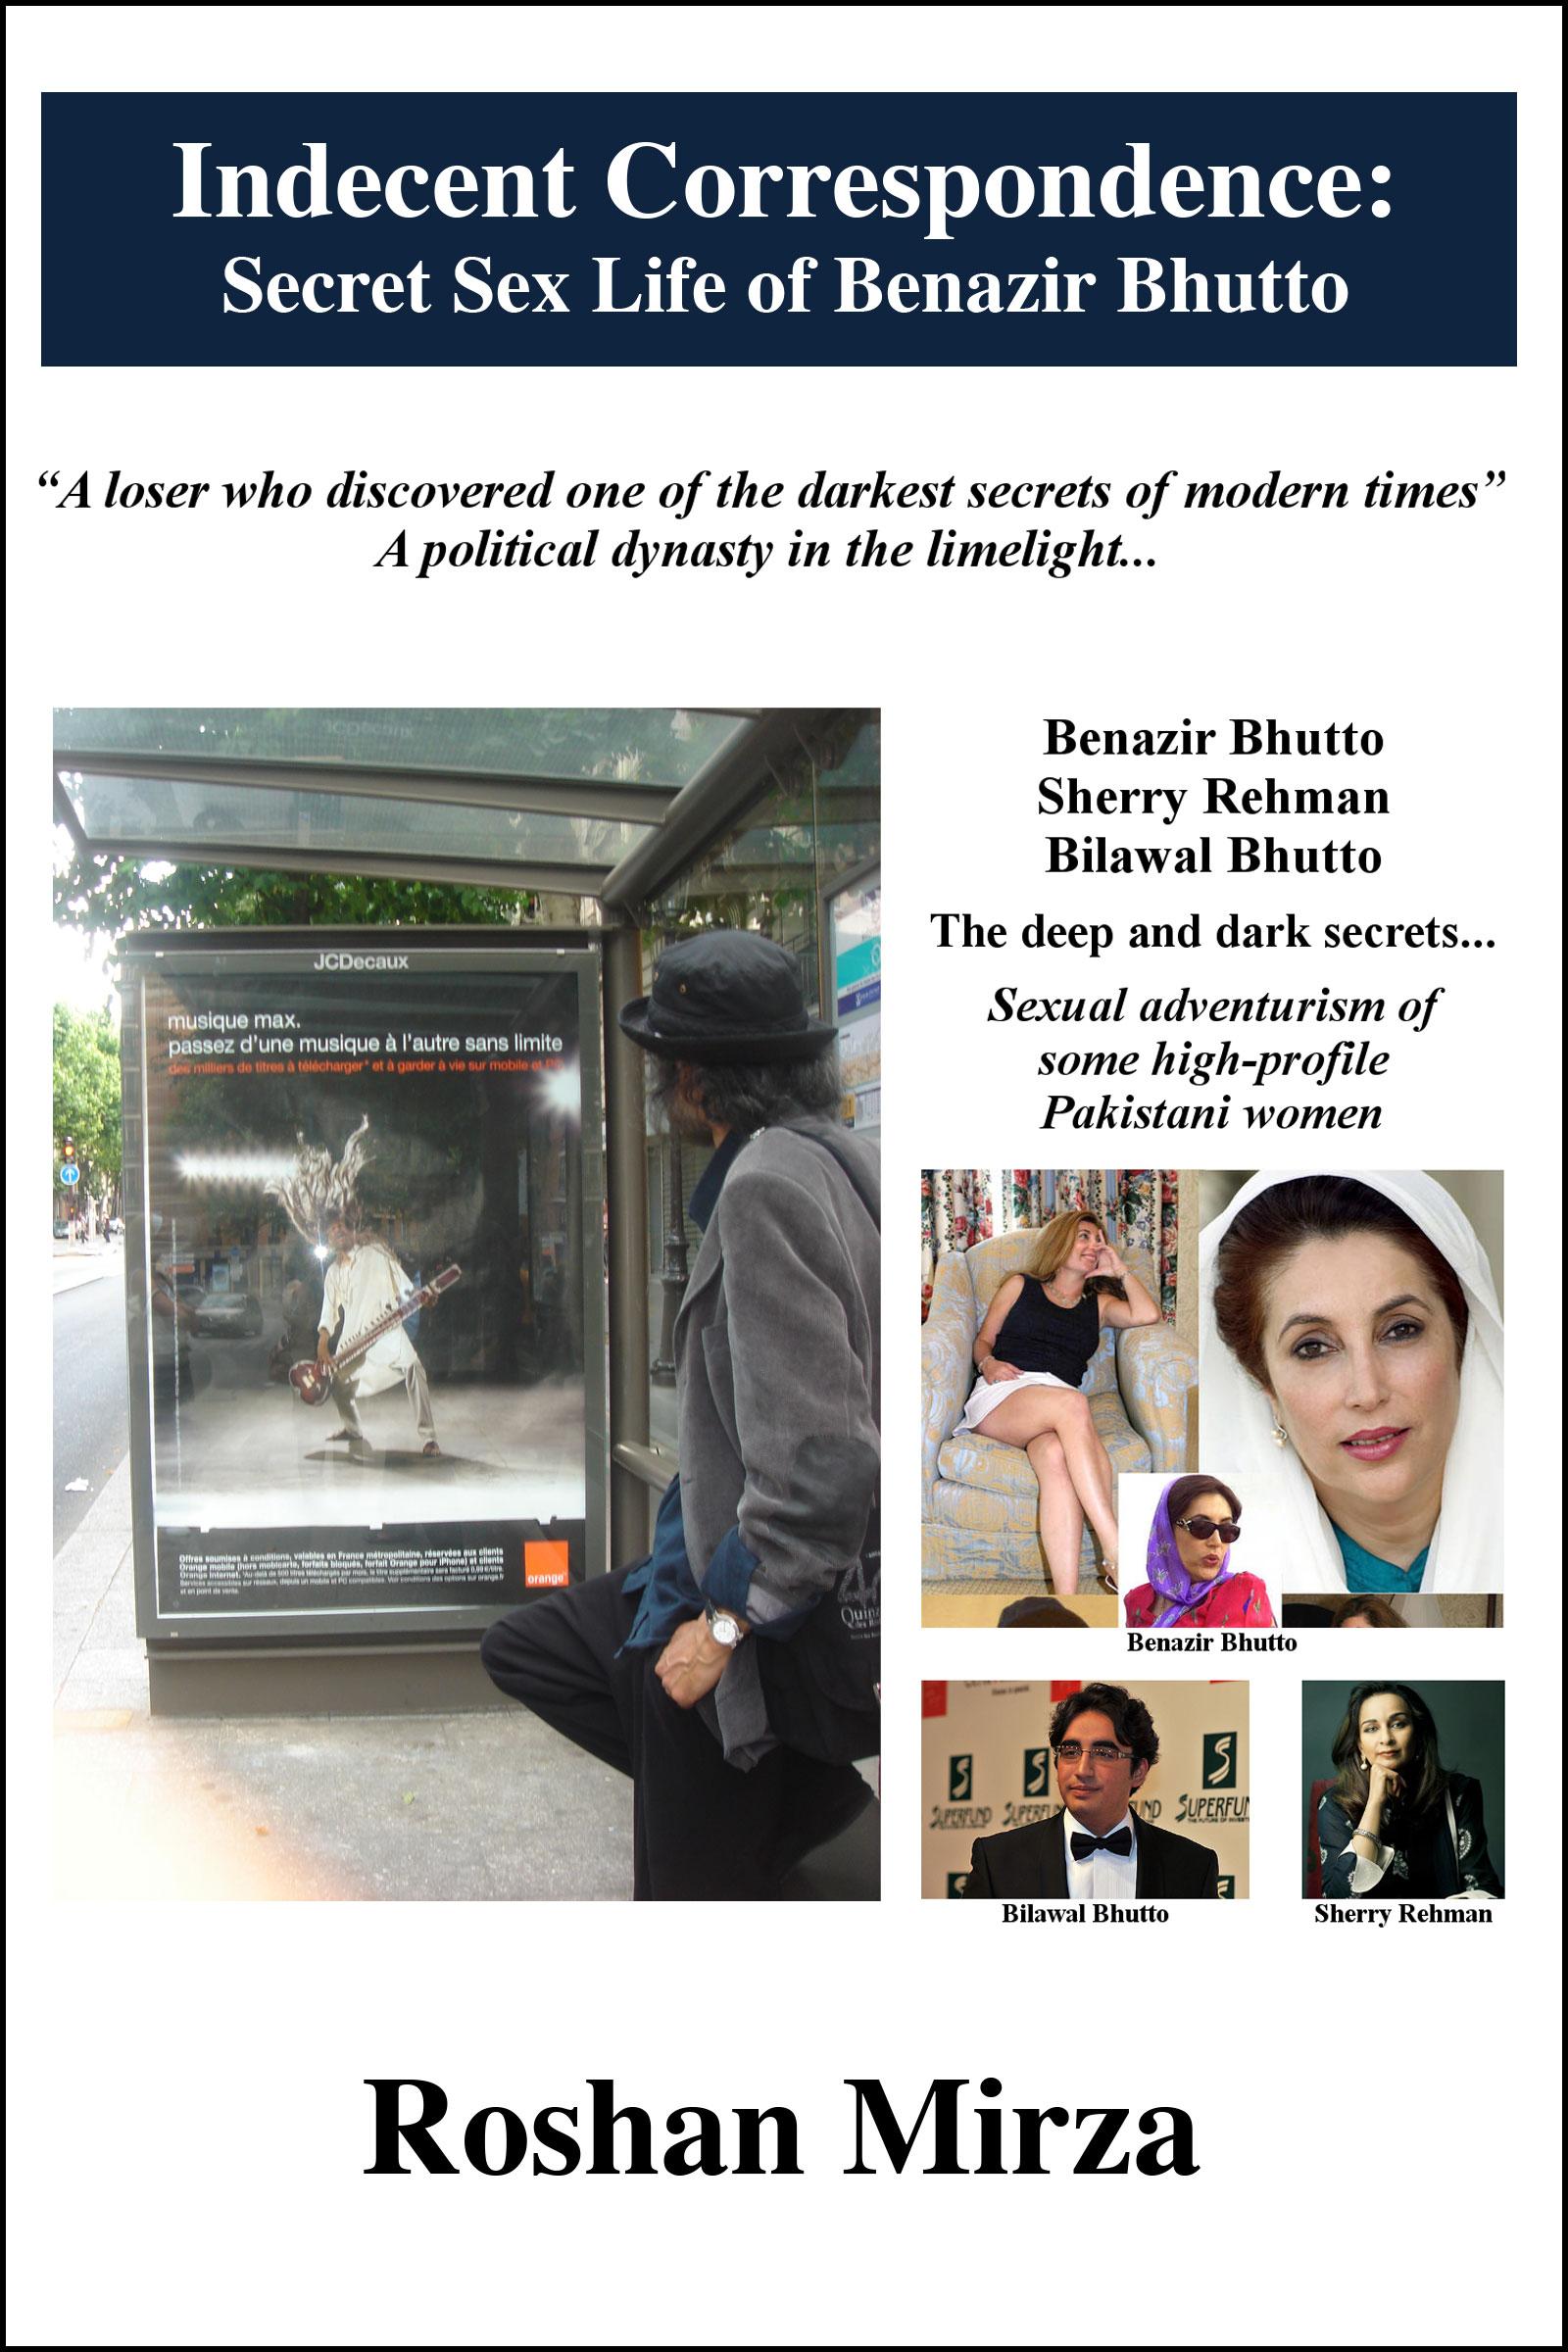 Indecent Correspondence: Secret Sex Life of Benazir Bhutto